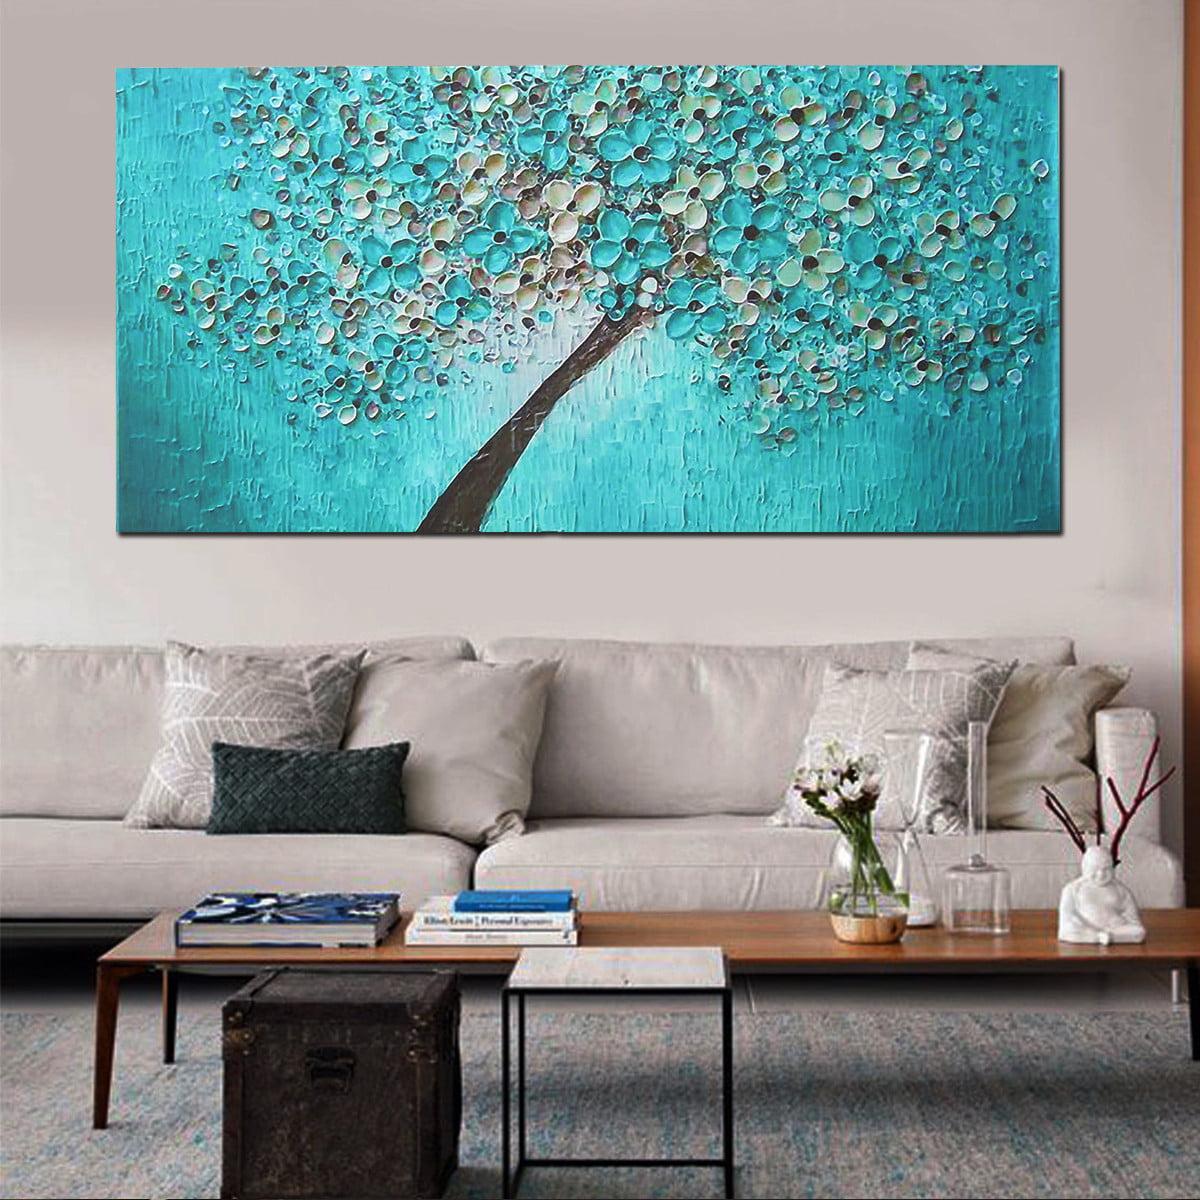 Unframed Print Canvas Blue Plum Flower Oil Painting Picture Home Bedroom Wall Art Decor 24''x47'' (Random Pattern)